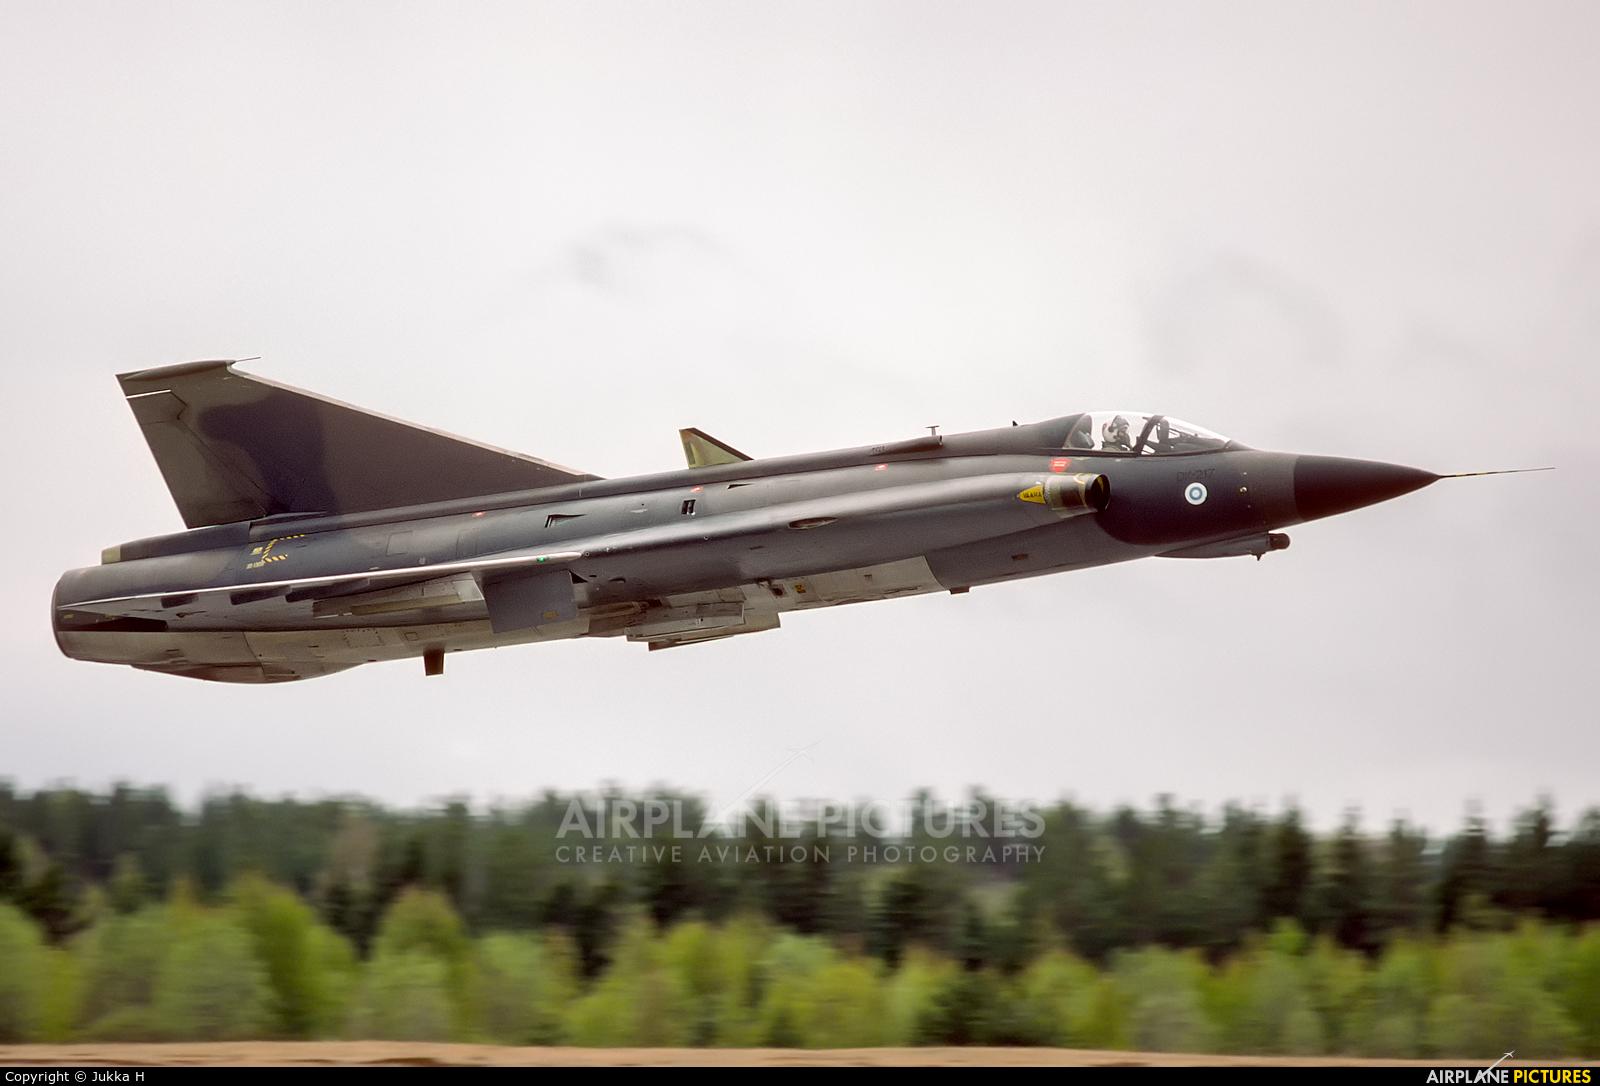 Finland - Air Force DK-217 aircraft at Jyväskylä